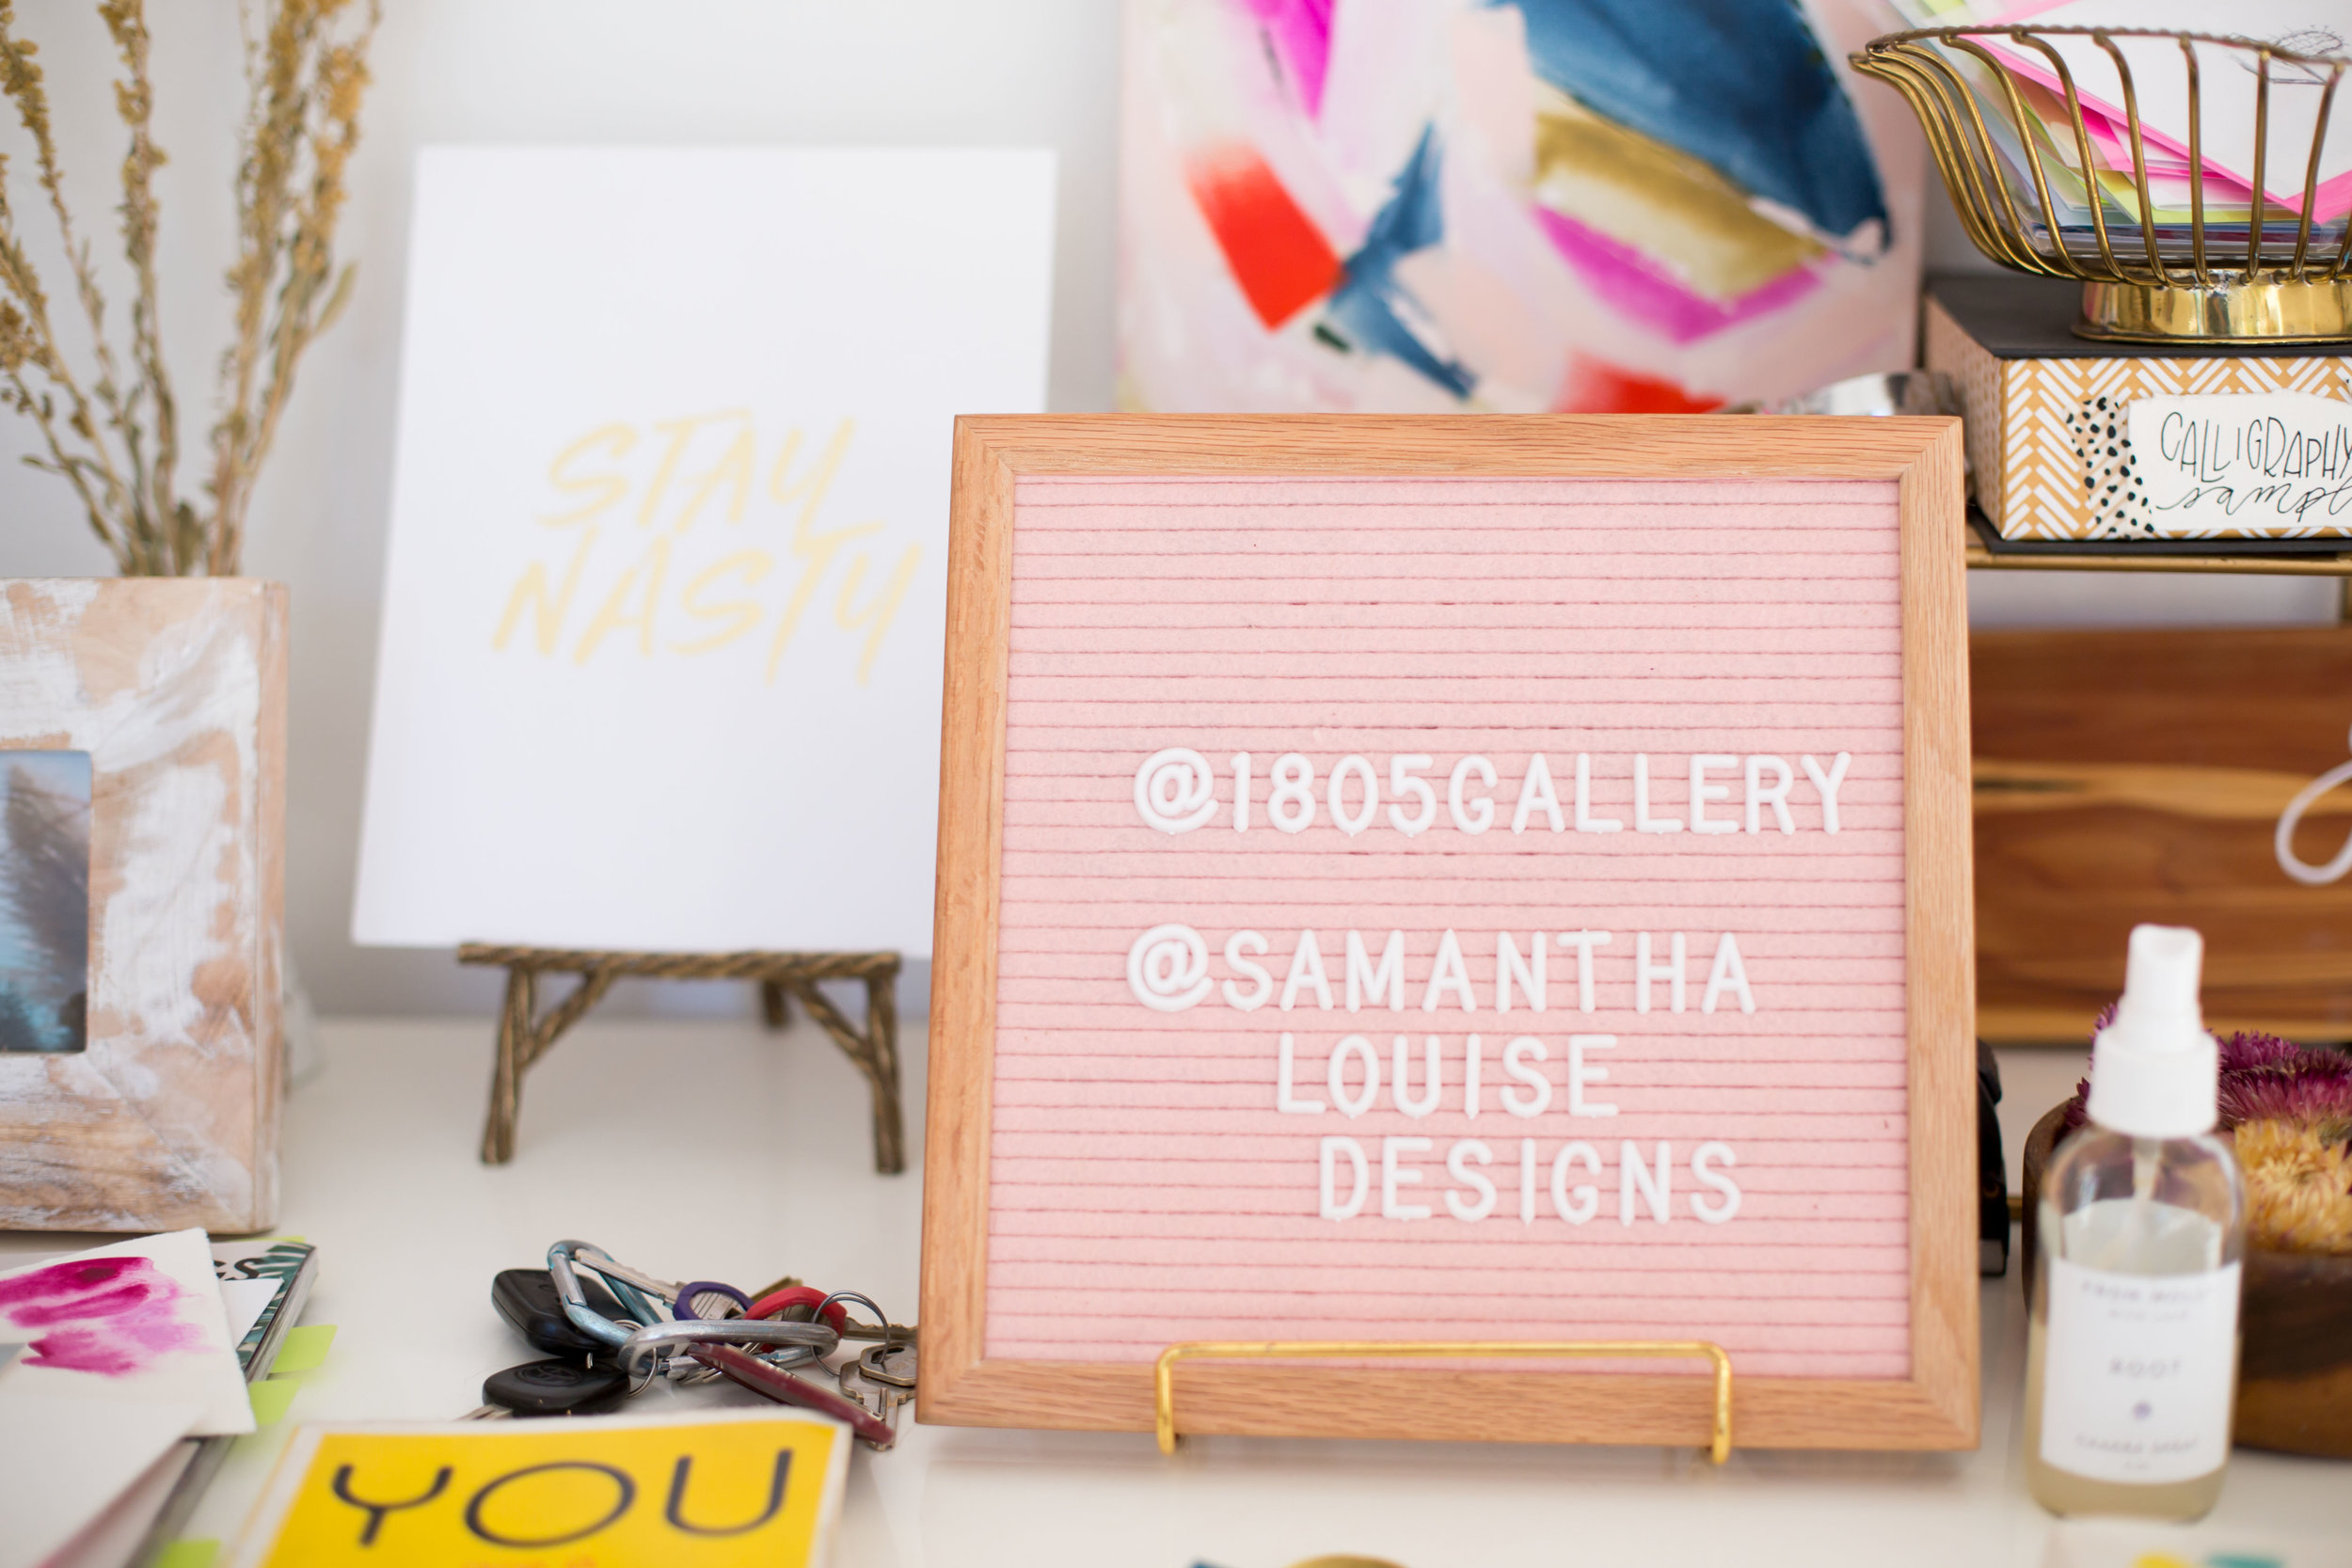 san-diego-photographer-branding-studio-create-with-gusto-artist-samantha-louise-marett-07.jpg